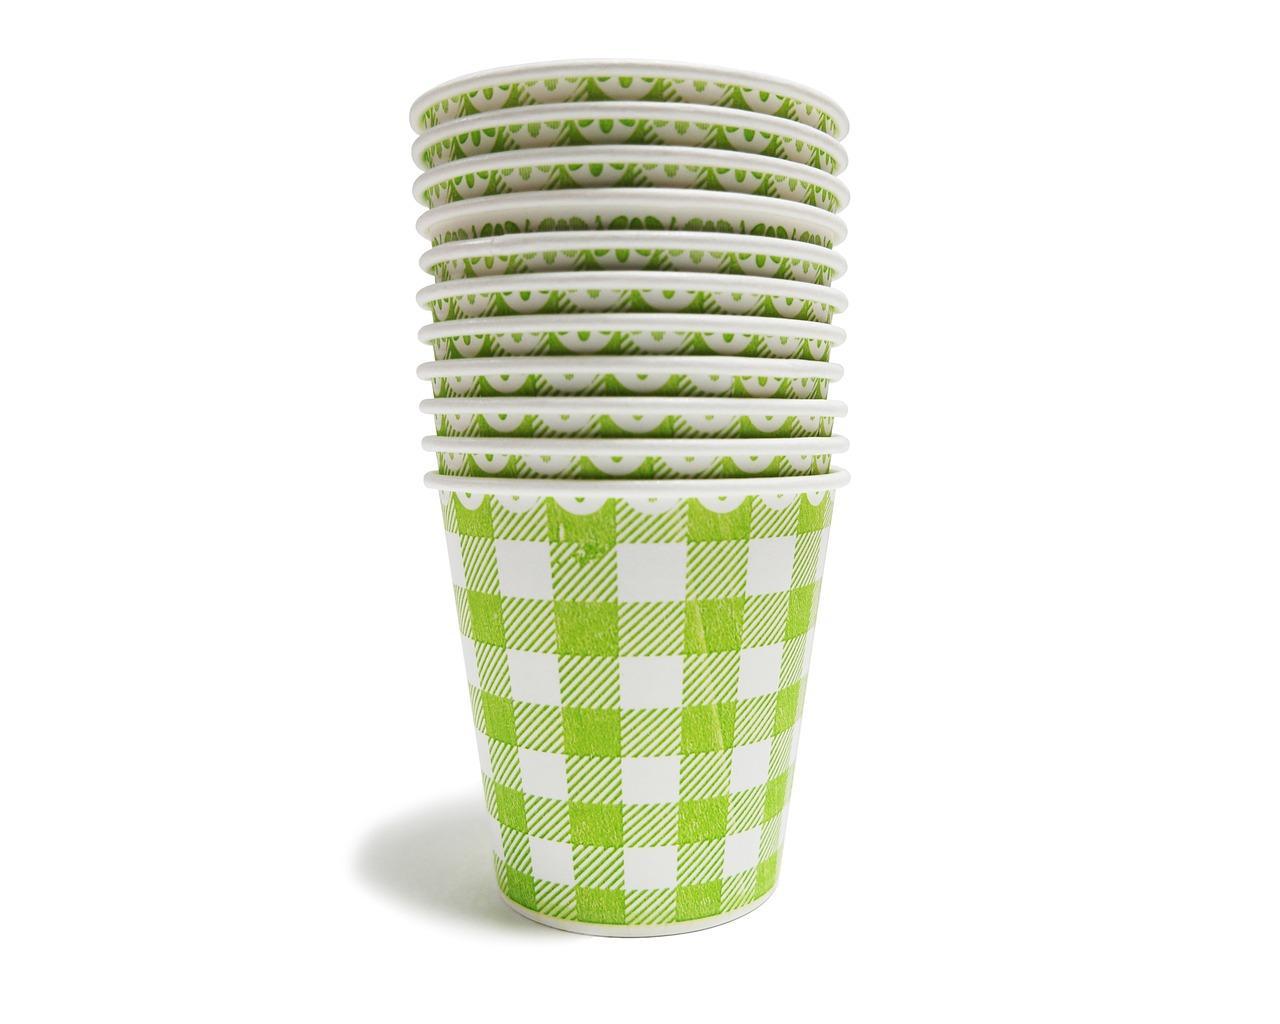 Sudarshan Cup Stock - 5 Kegunaan Kertas Duplex untuk Kemasan Produk yang Menarik